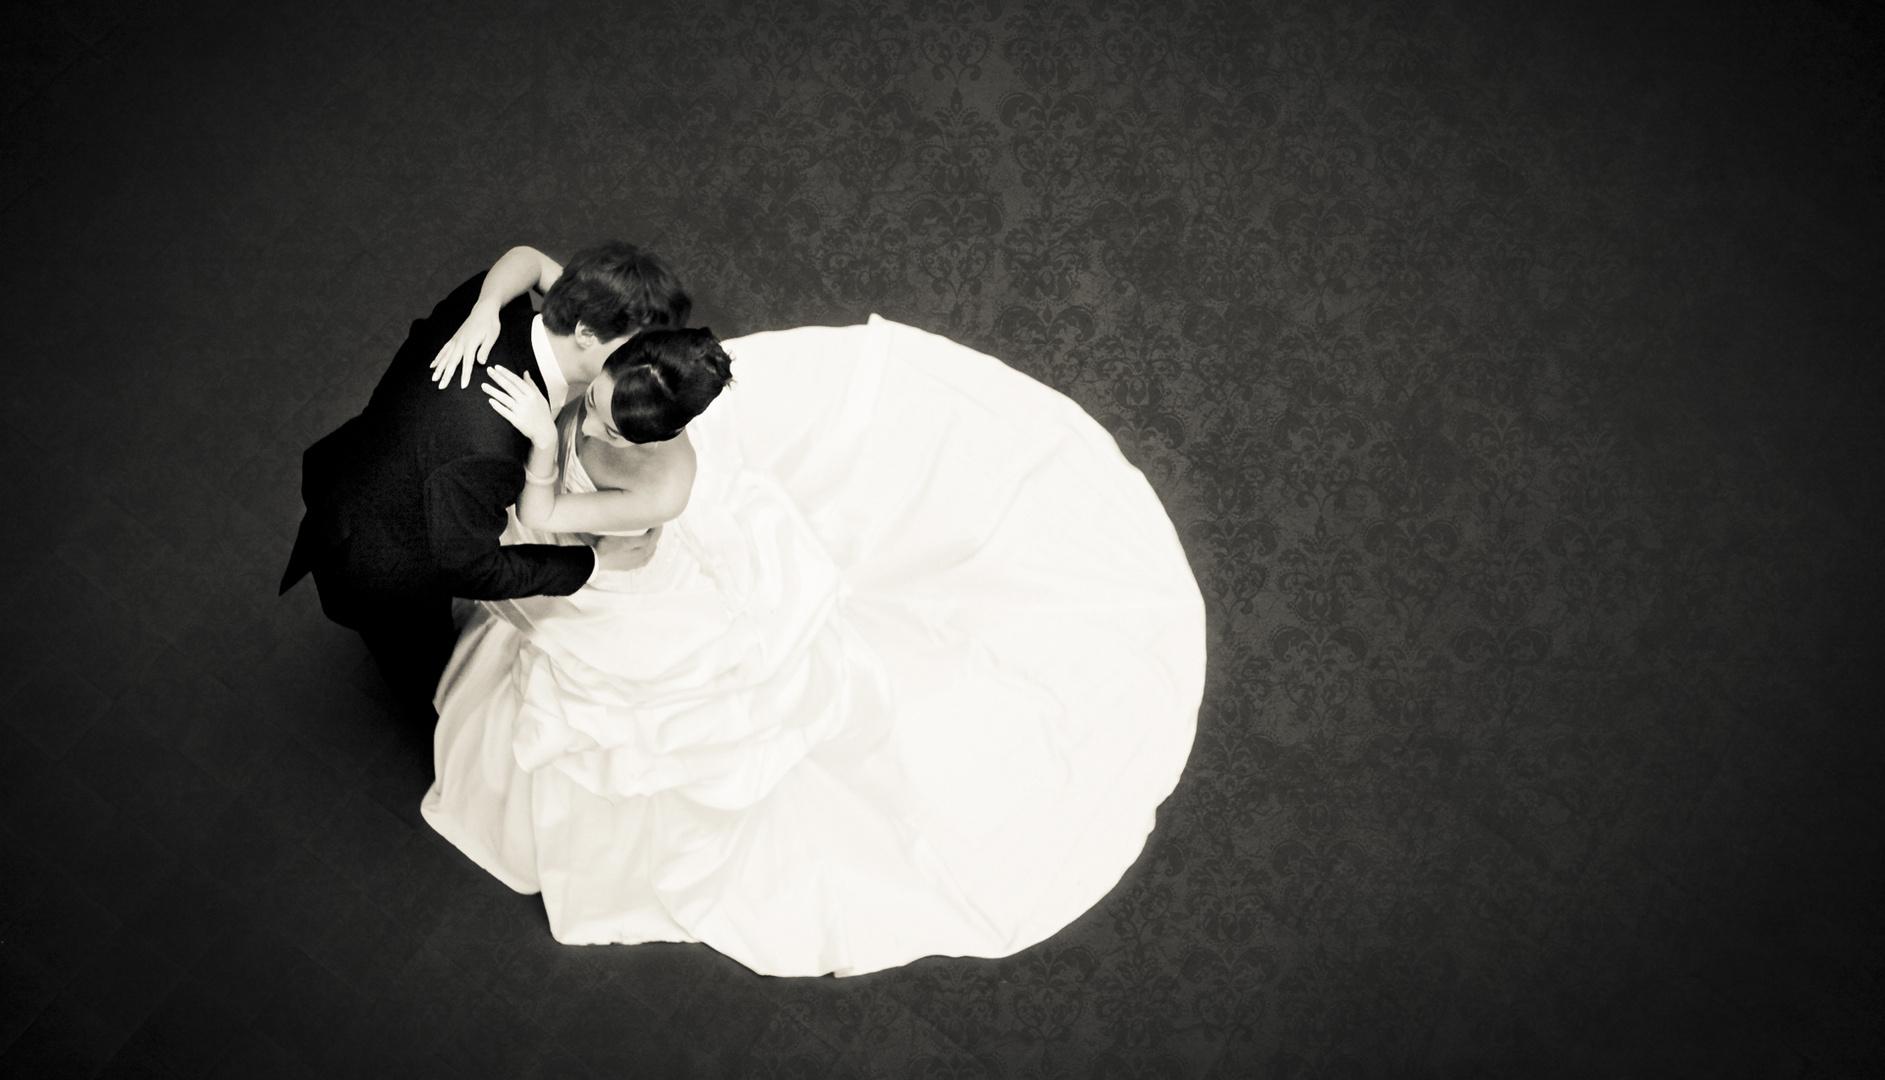 Winter Wedding Silence 2 Foto Bild Hochzeit Umarmung Brautpaar